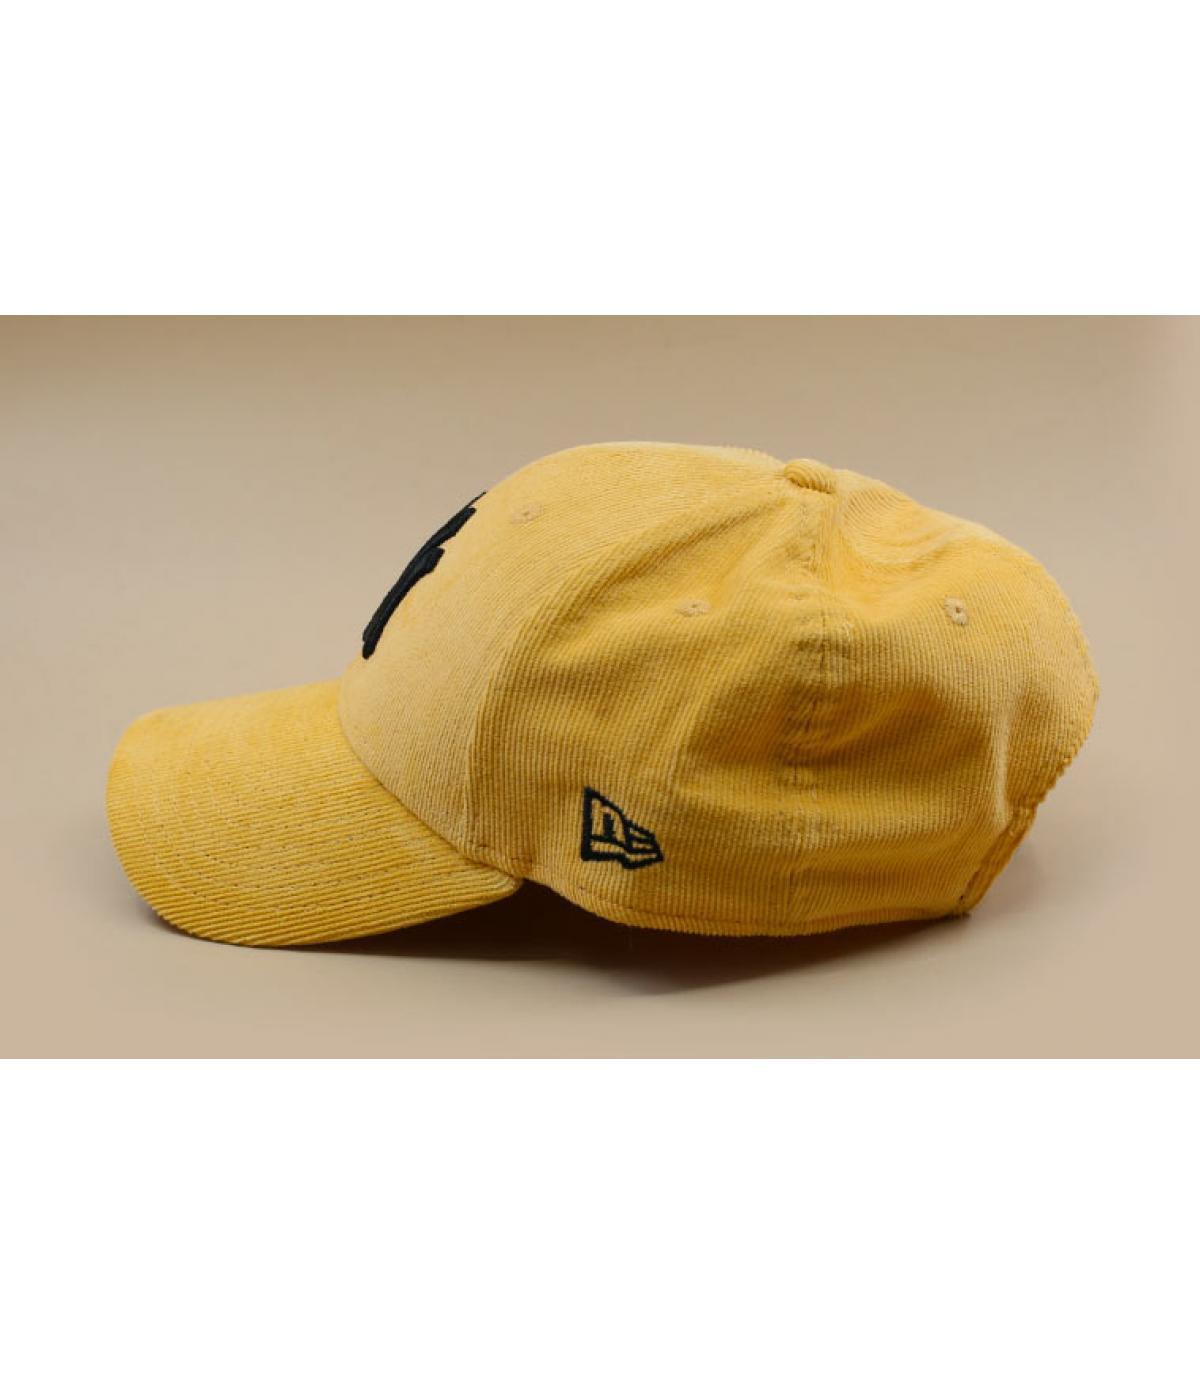 Dettagli Cord Pack 940 NY mellow yellow black - image 4